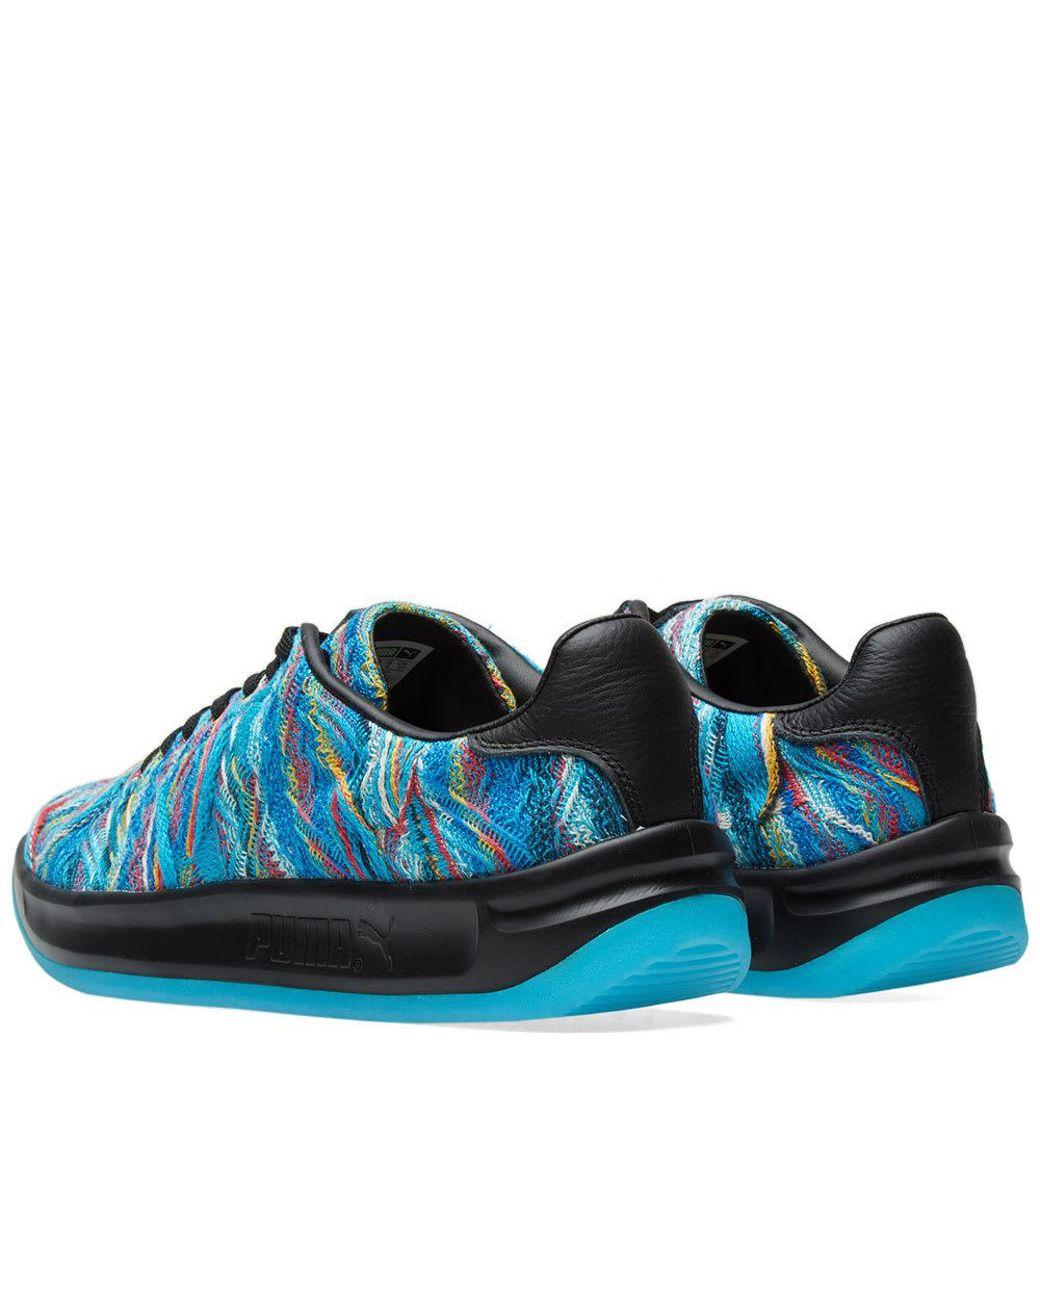 separation shoes 1408a cab32 Men's Black X Coogi California